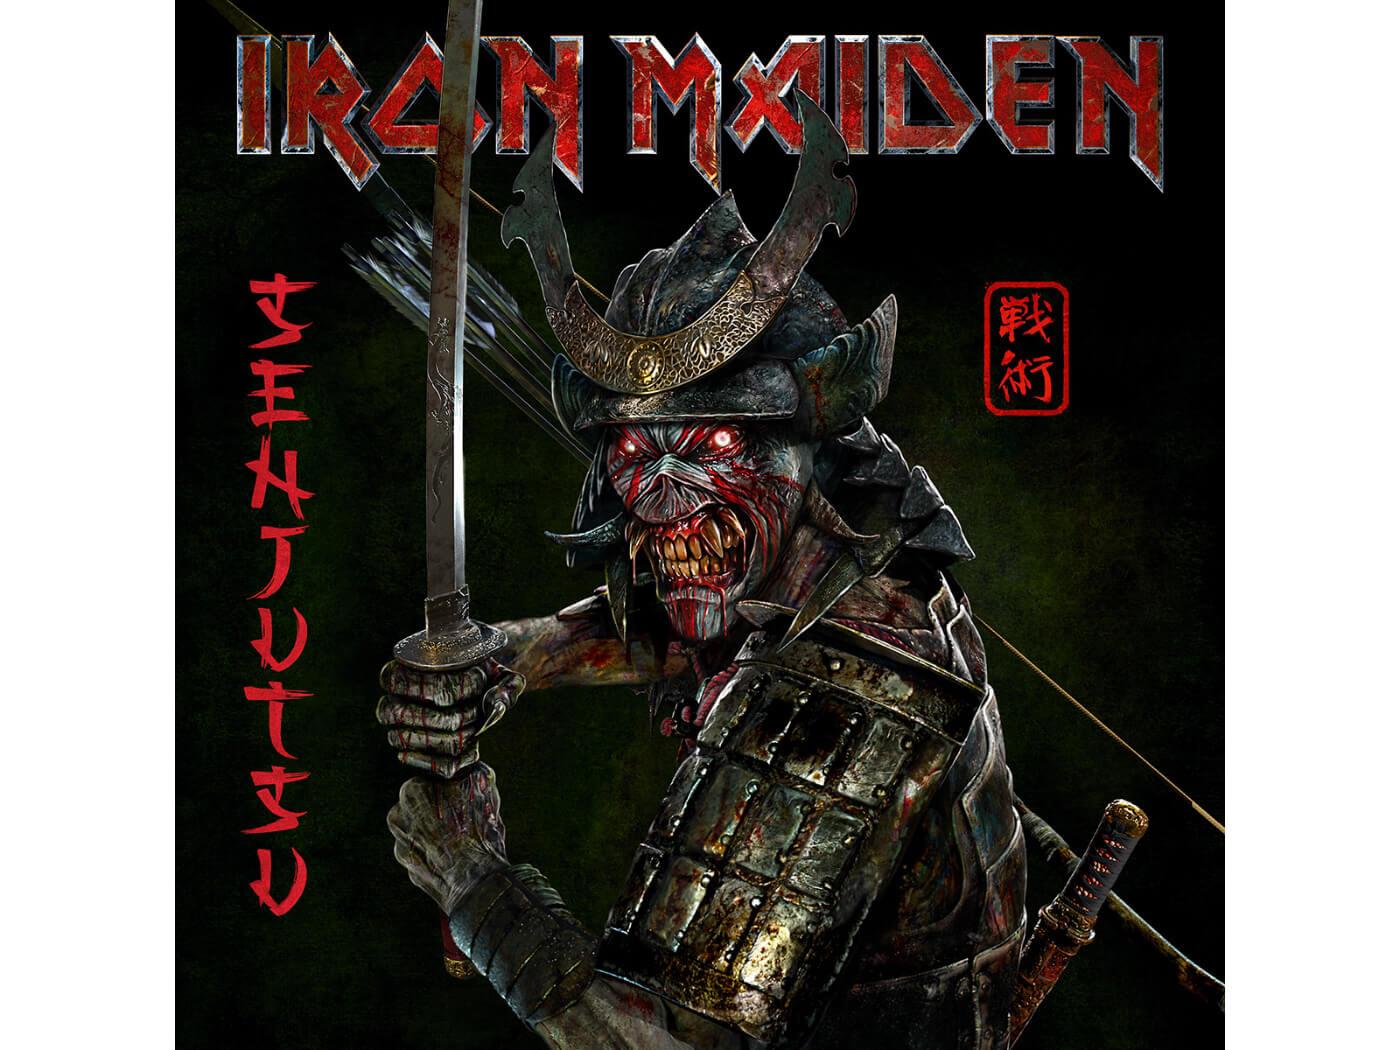 Iron Maiden's new album cover